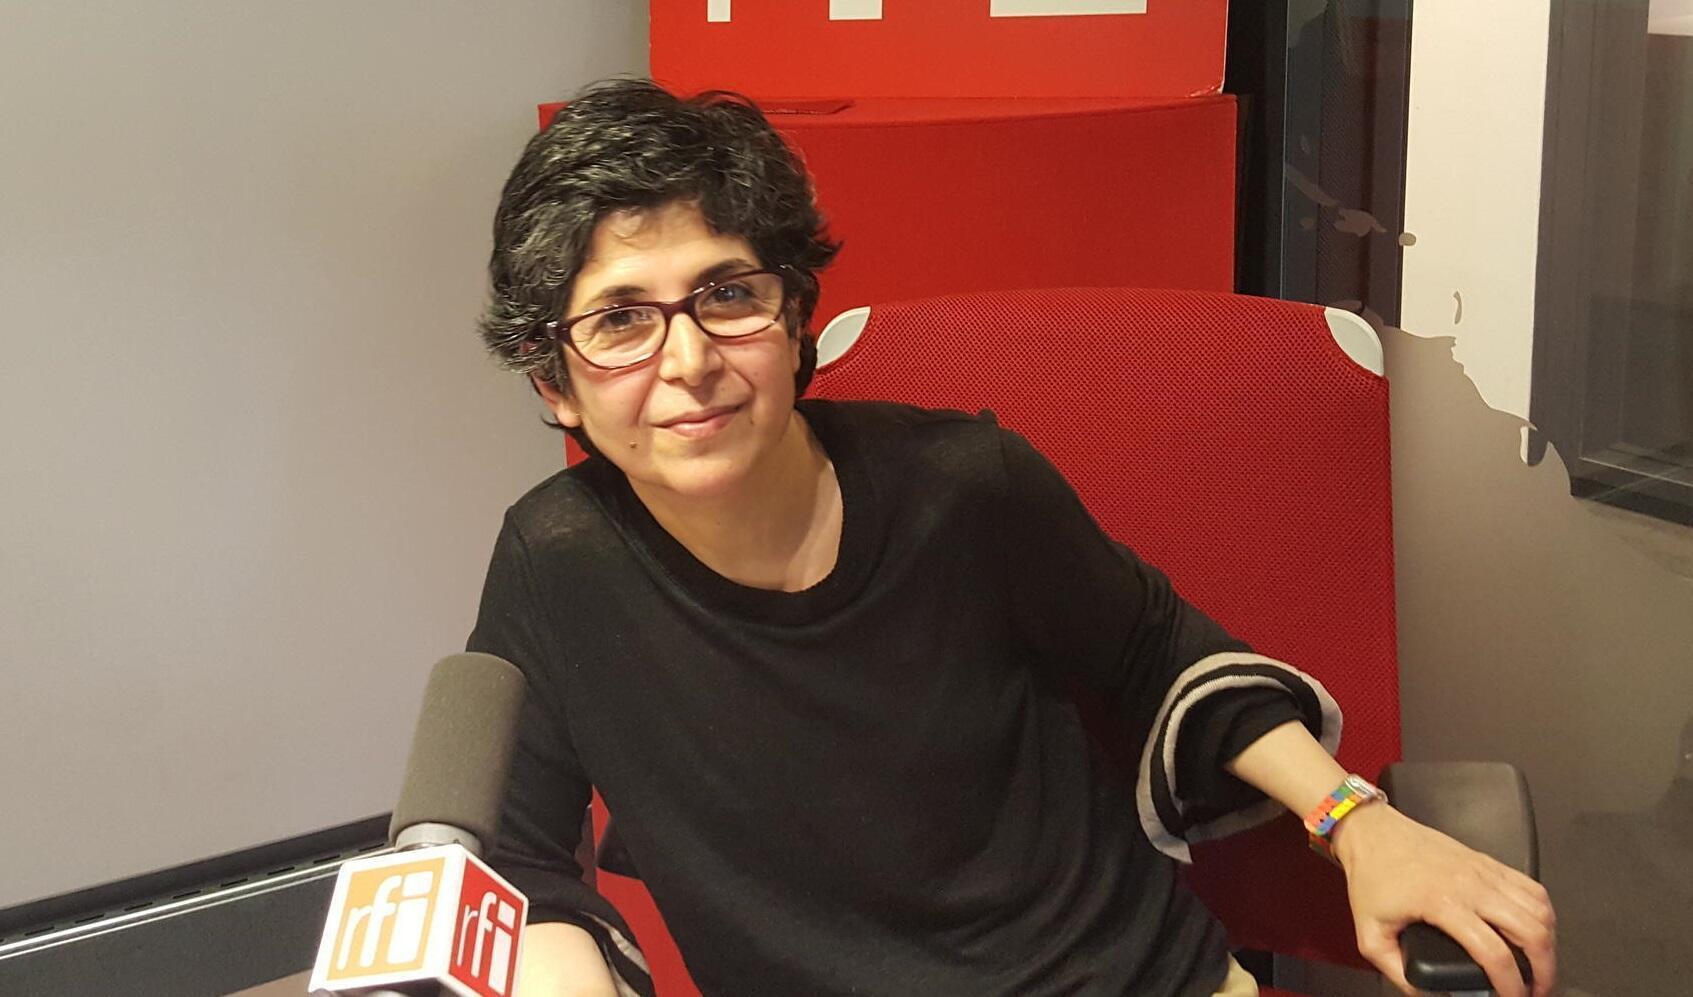 2020-05-19 france iran fariba adelkhah academic prison